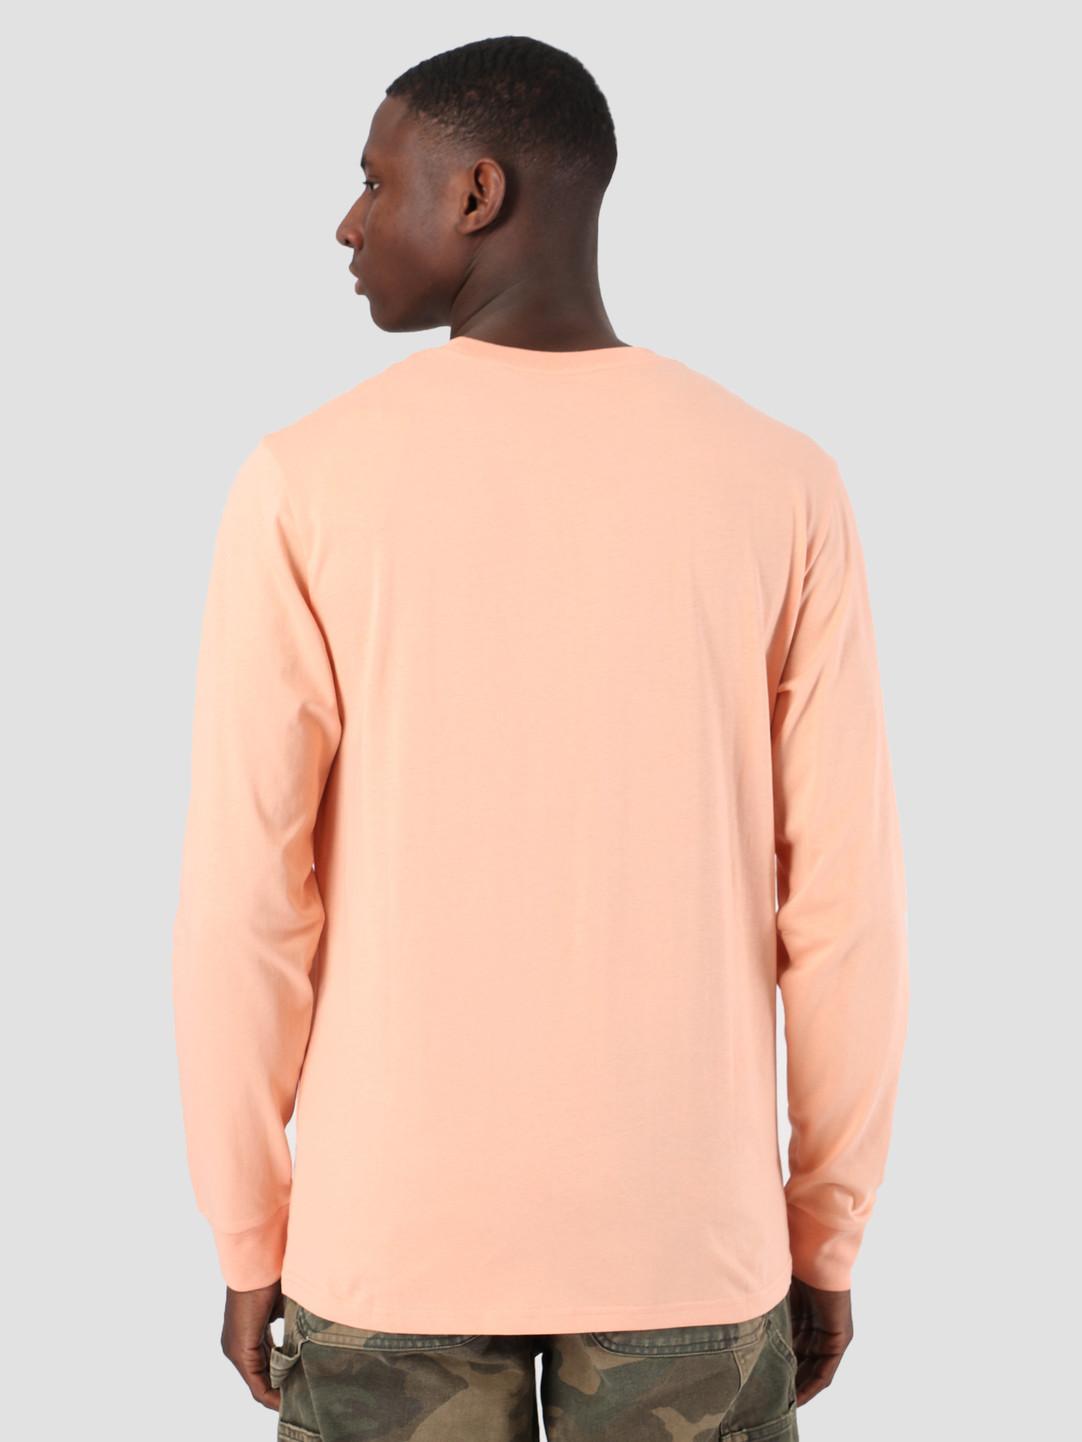 Carhartt WIP Carhartt WIP Long Sleeve Pocket T-Shirt Peach 61091000